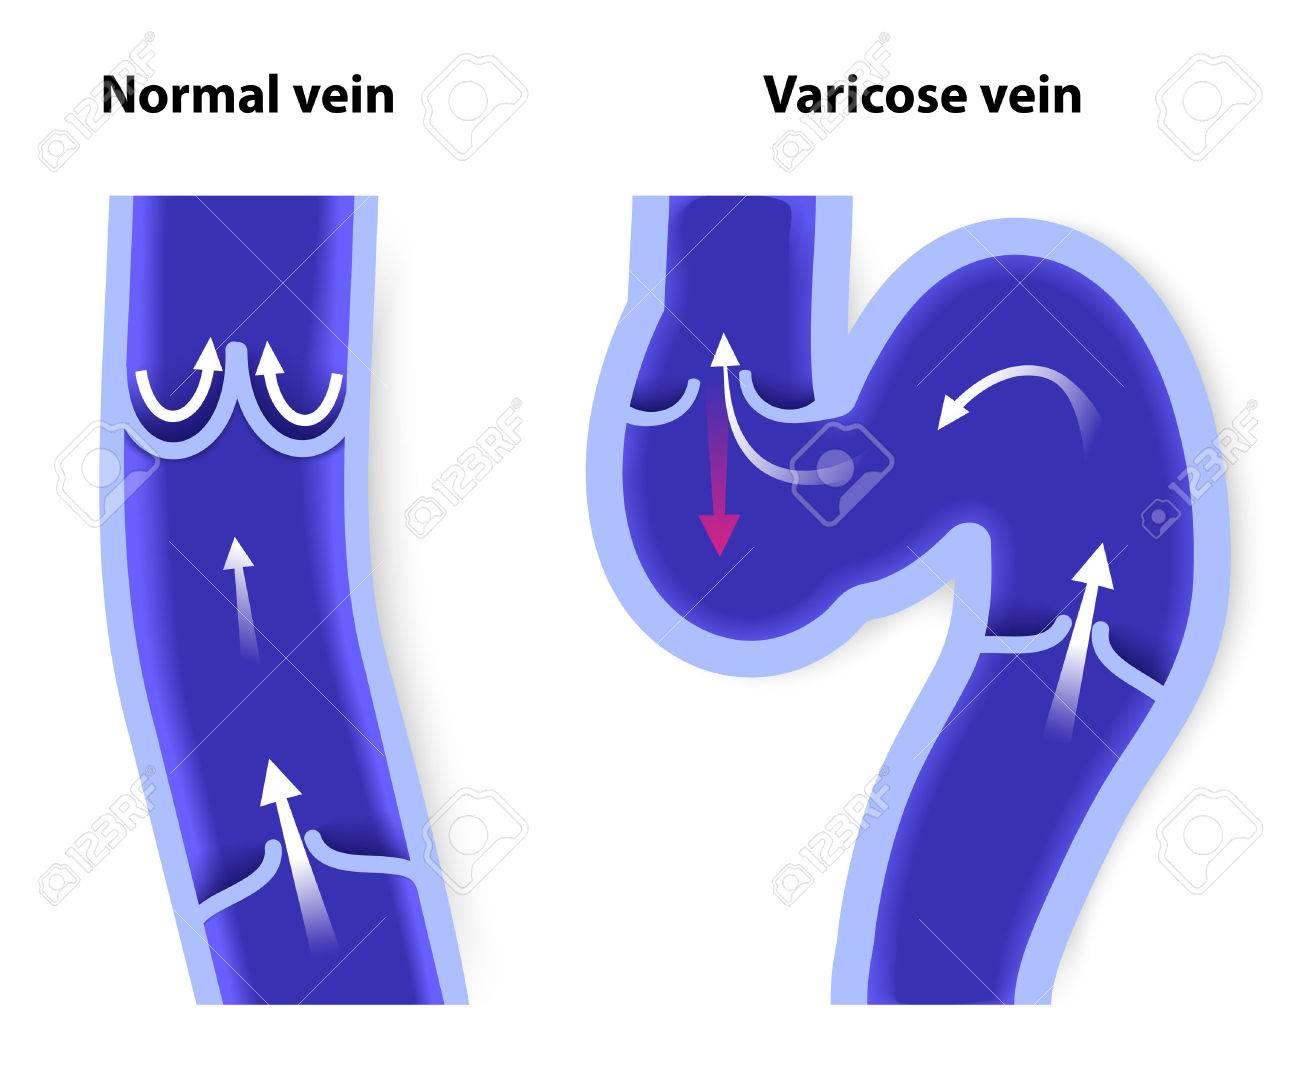 hight resolution of healthy vein and varicose vein human veins vector diagram stock vector 30673881